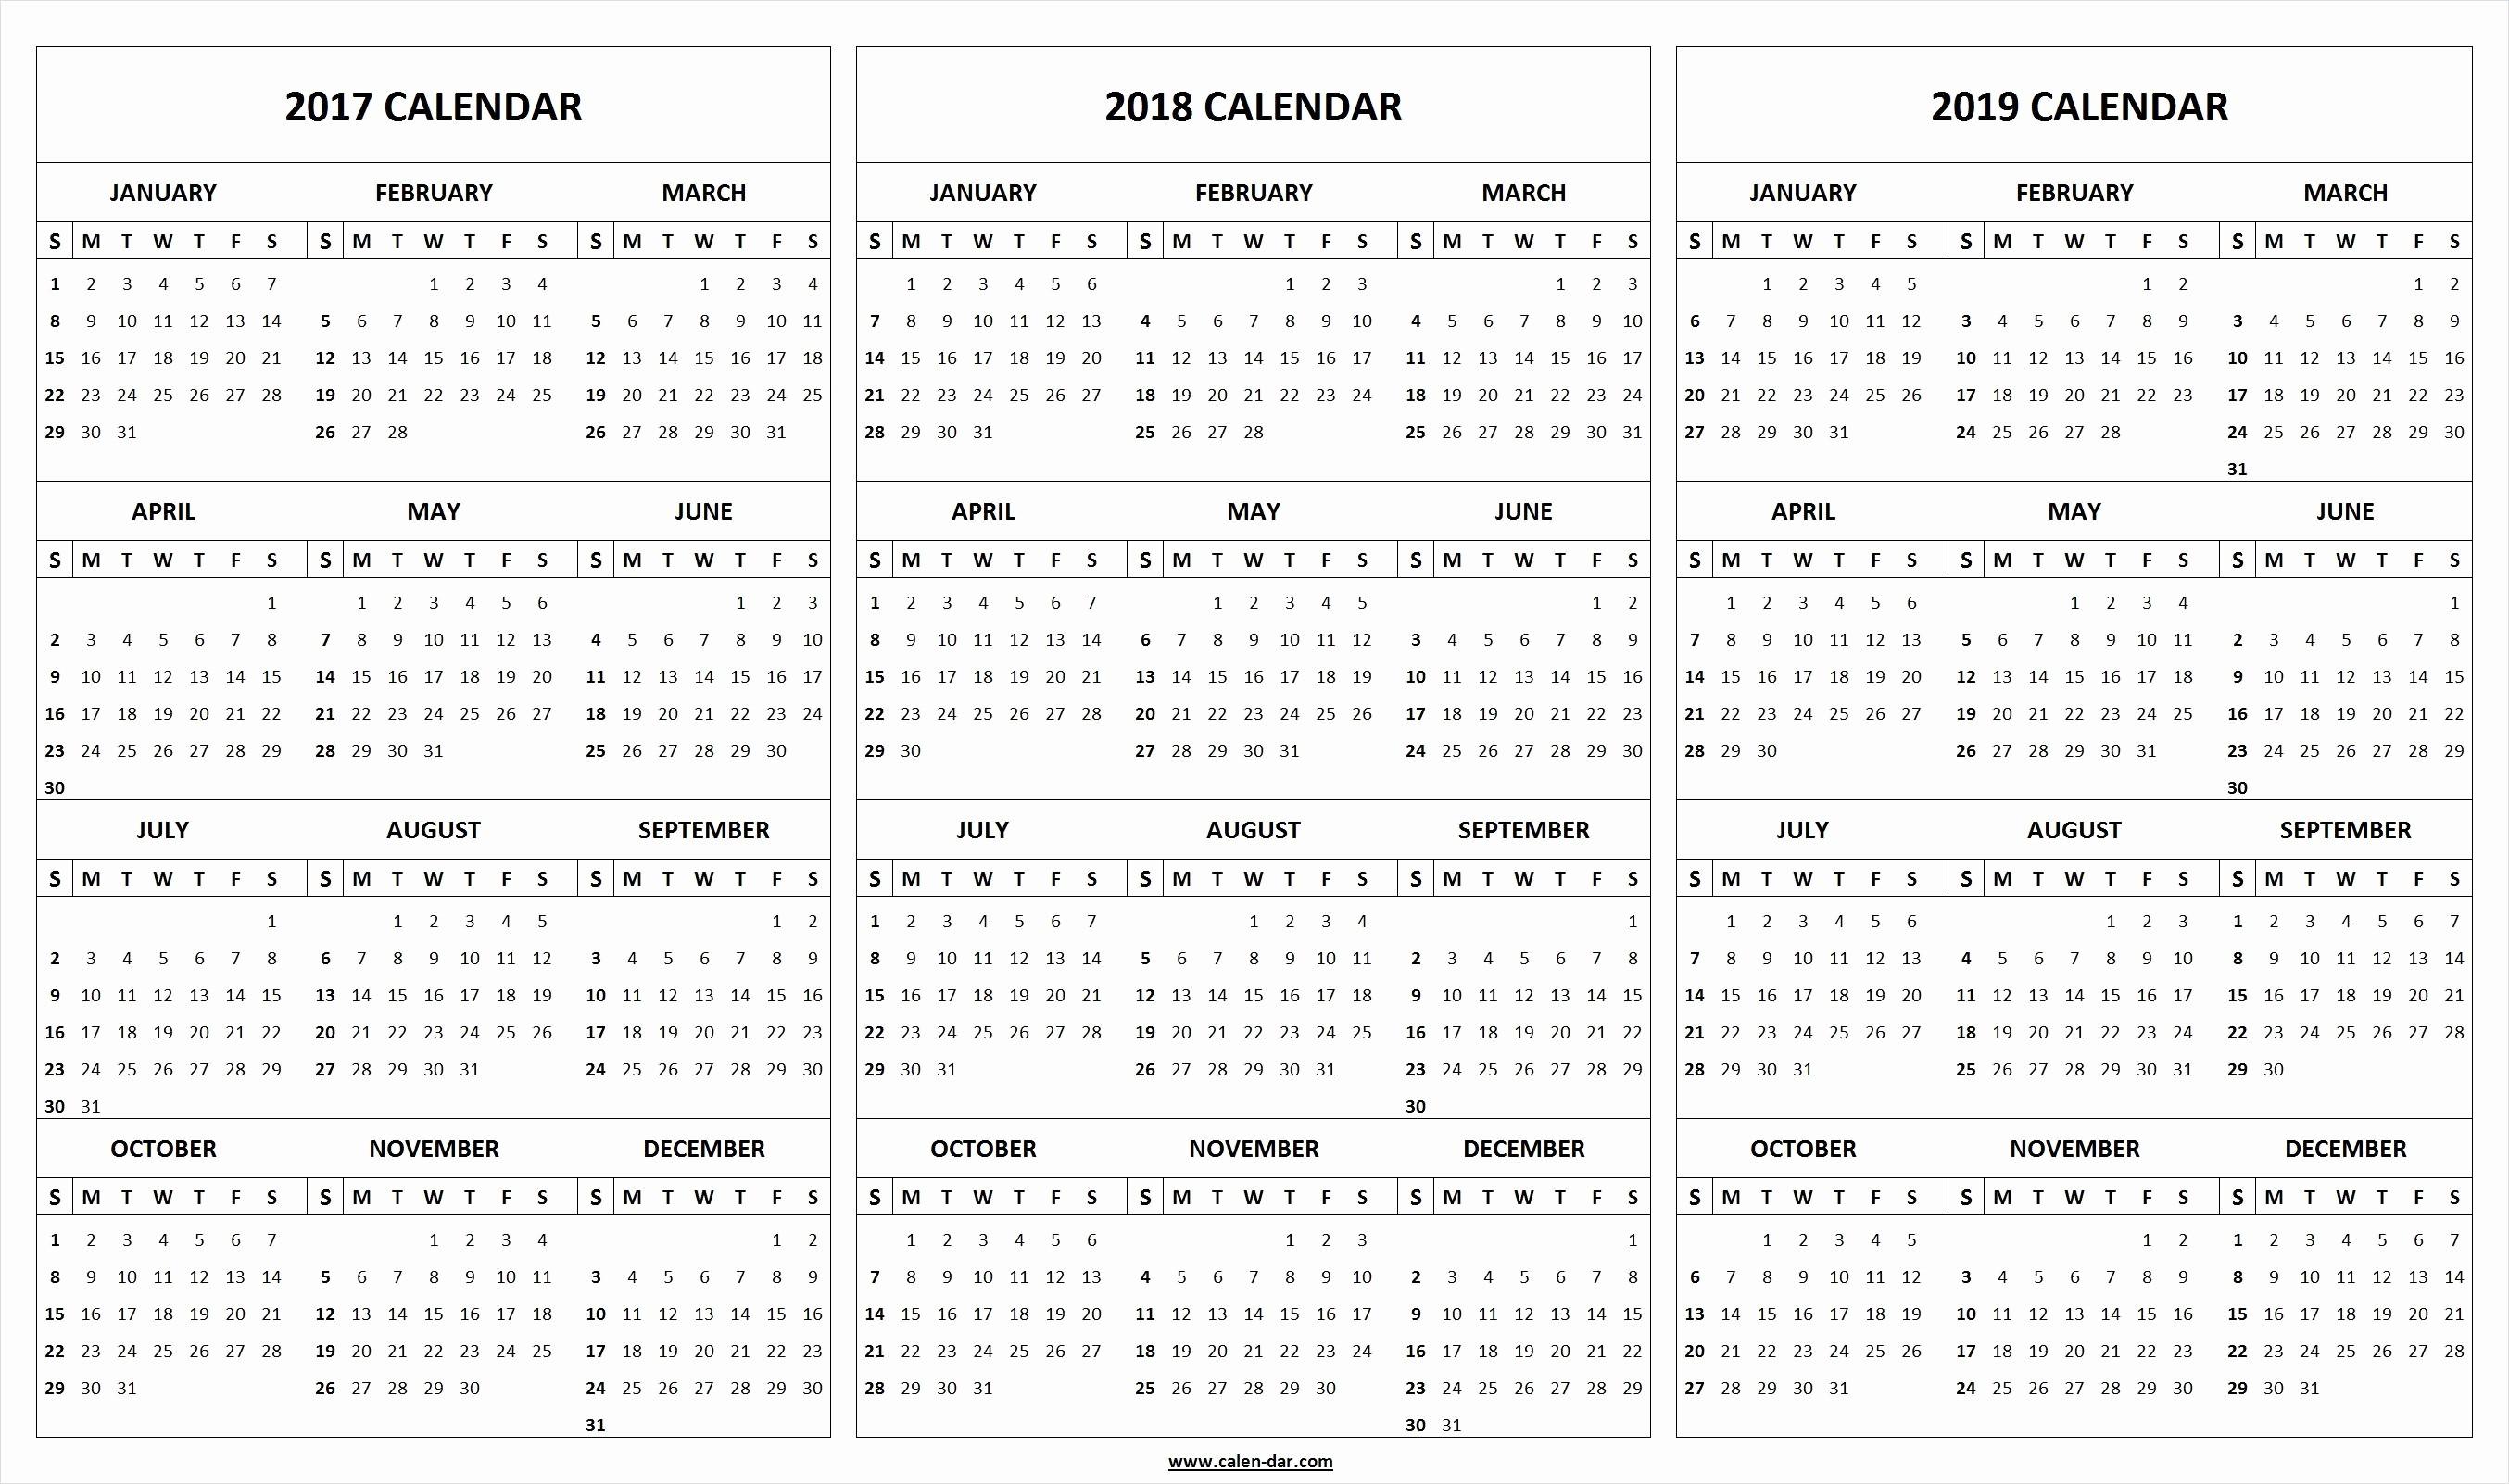 2017-2018 Blank Calendar Beautiful Get Free Blank Printable 2017 2018 2019 Calendar Template